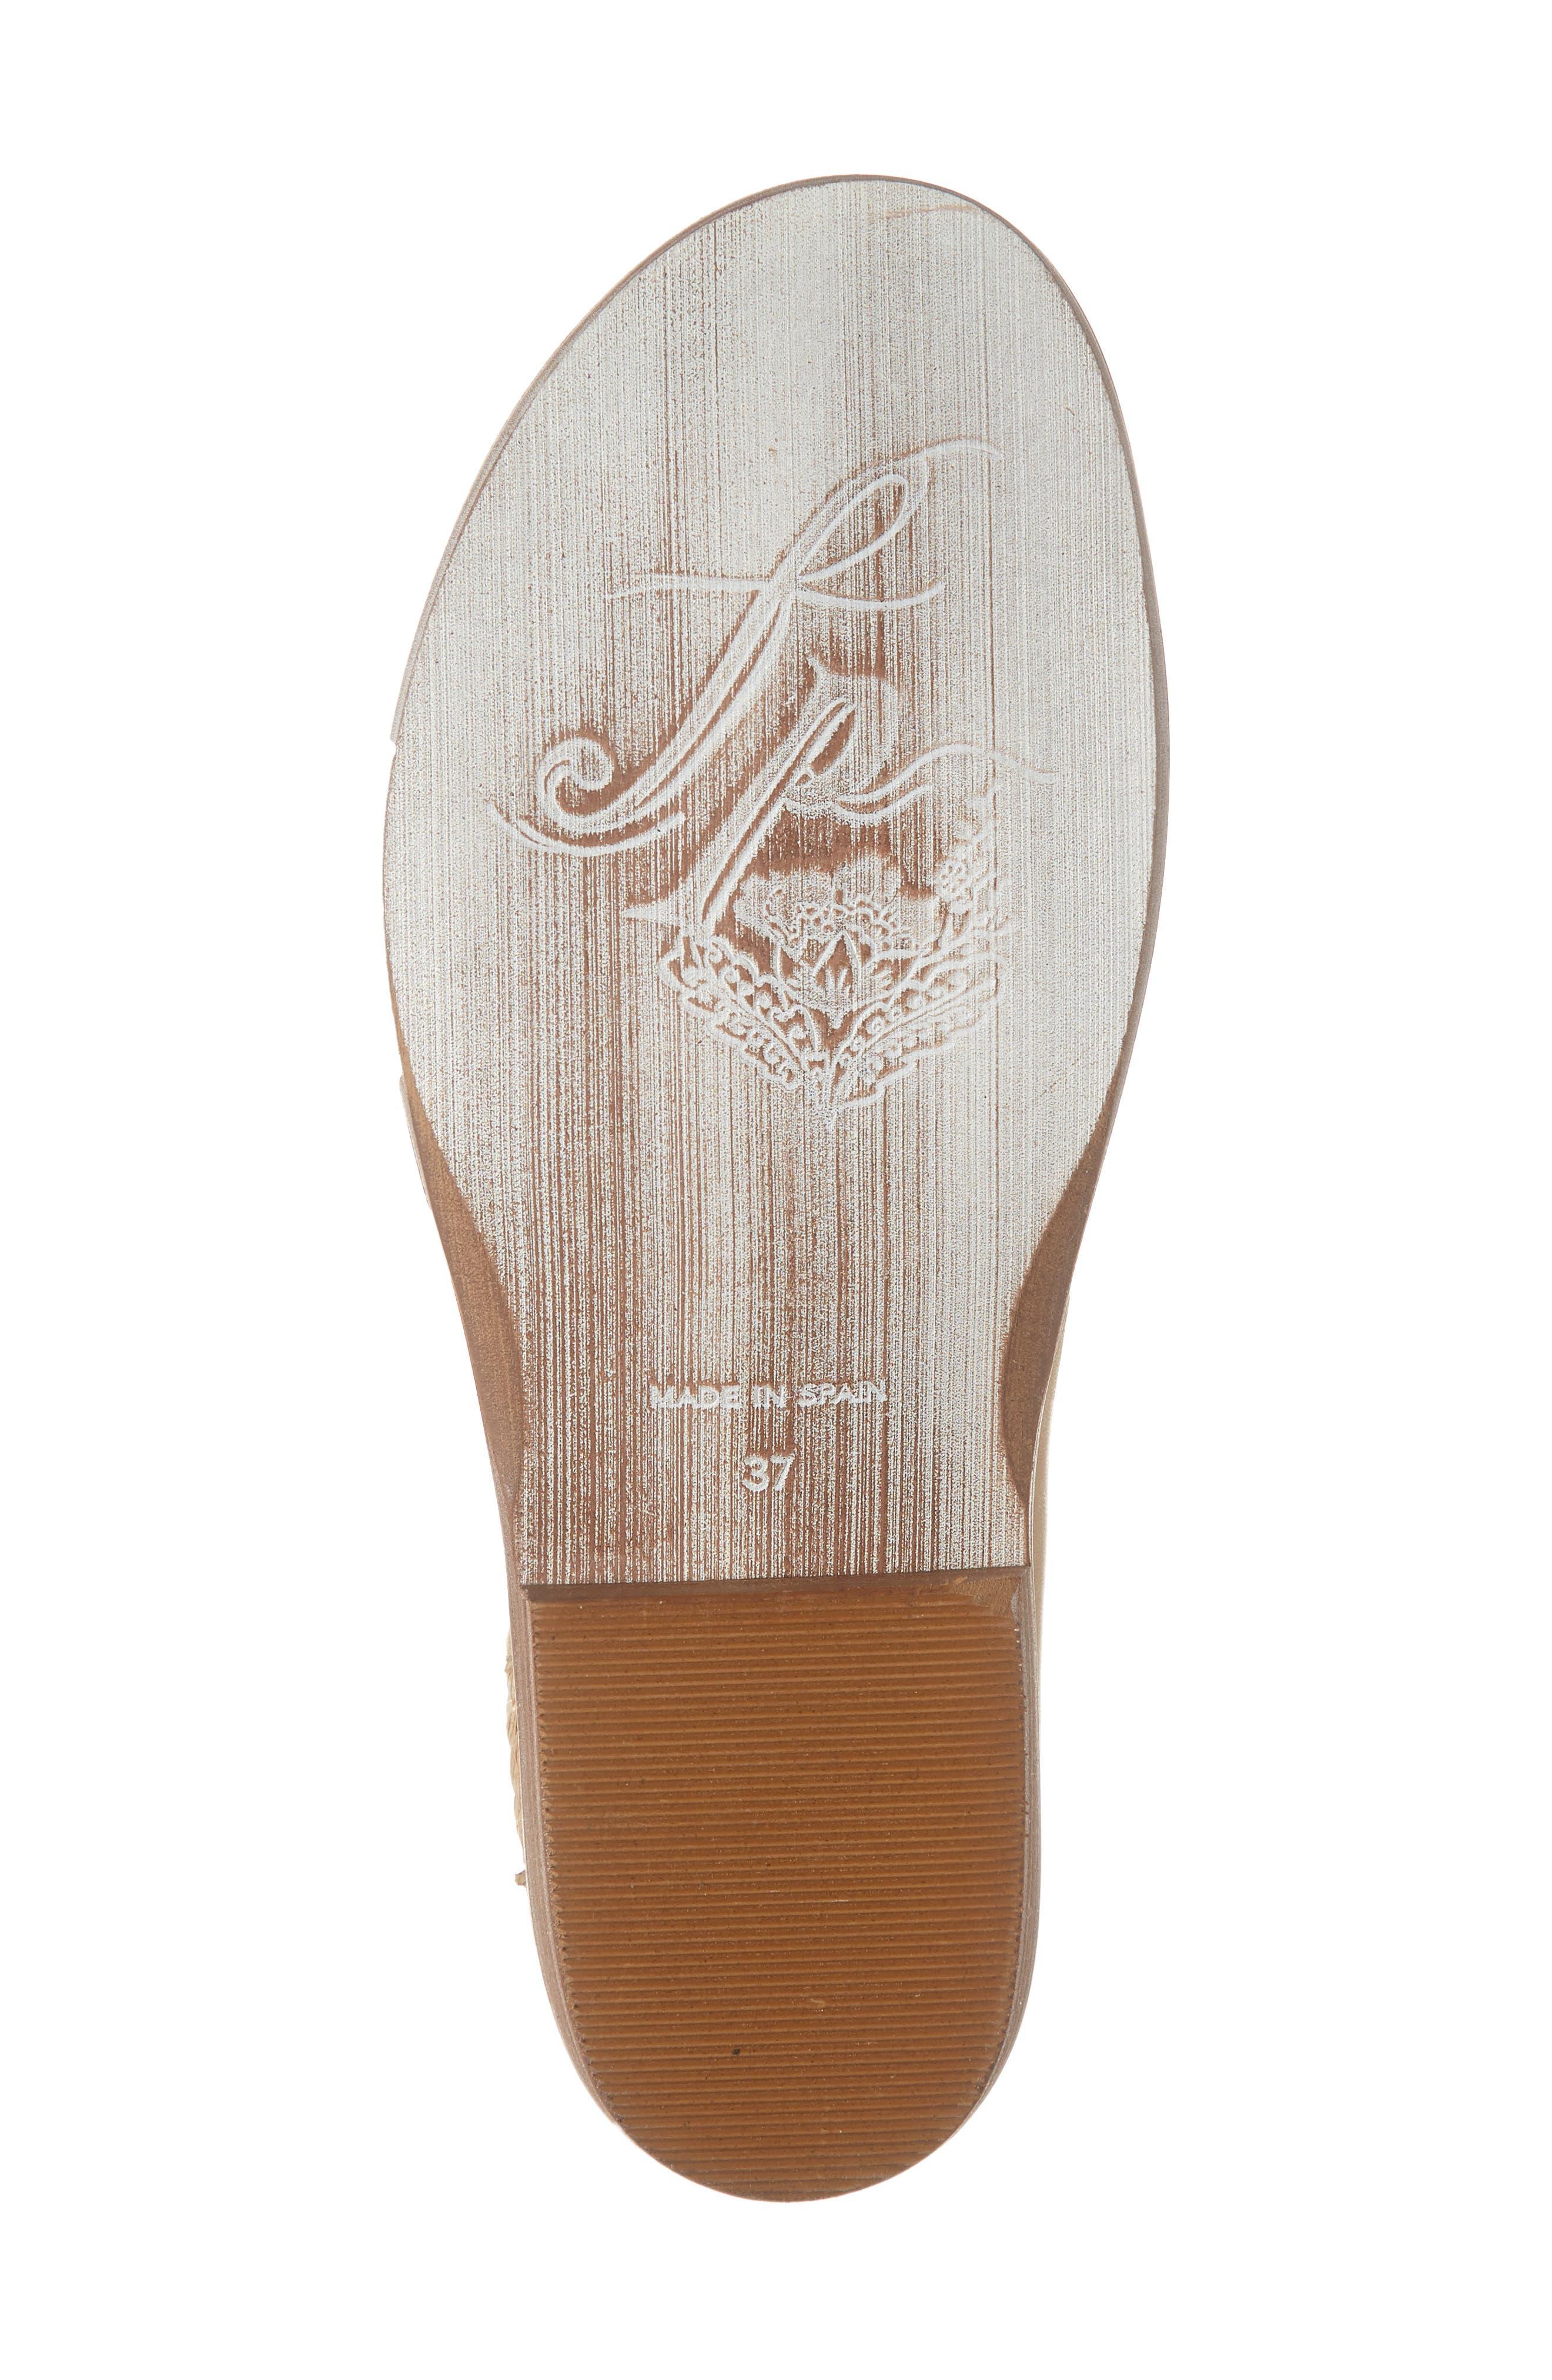 FREE PEOPLE, 'Mont Blanc' Asymmetrical Sandal, Alternate thumbnail 6, color, NATURAL